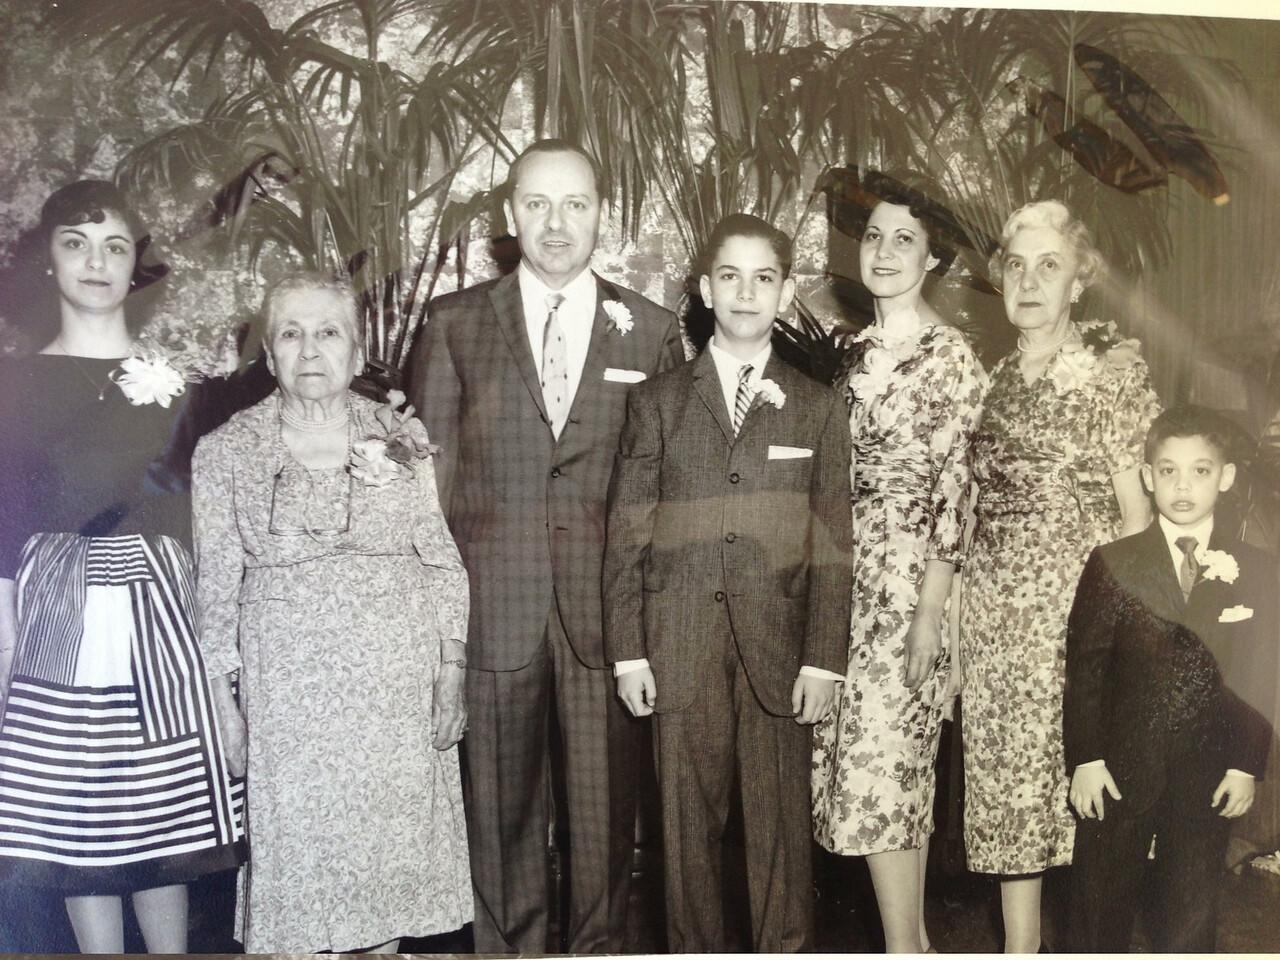 Sandy, Grandma Diskin, Bob, David, Diane, Grandma Small, Mark, David's Bar Mitzvah